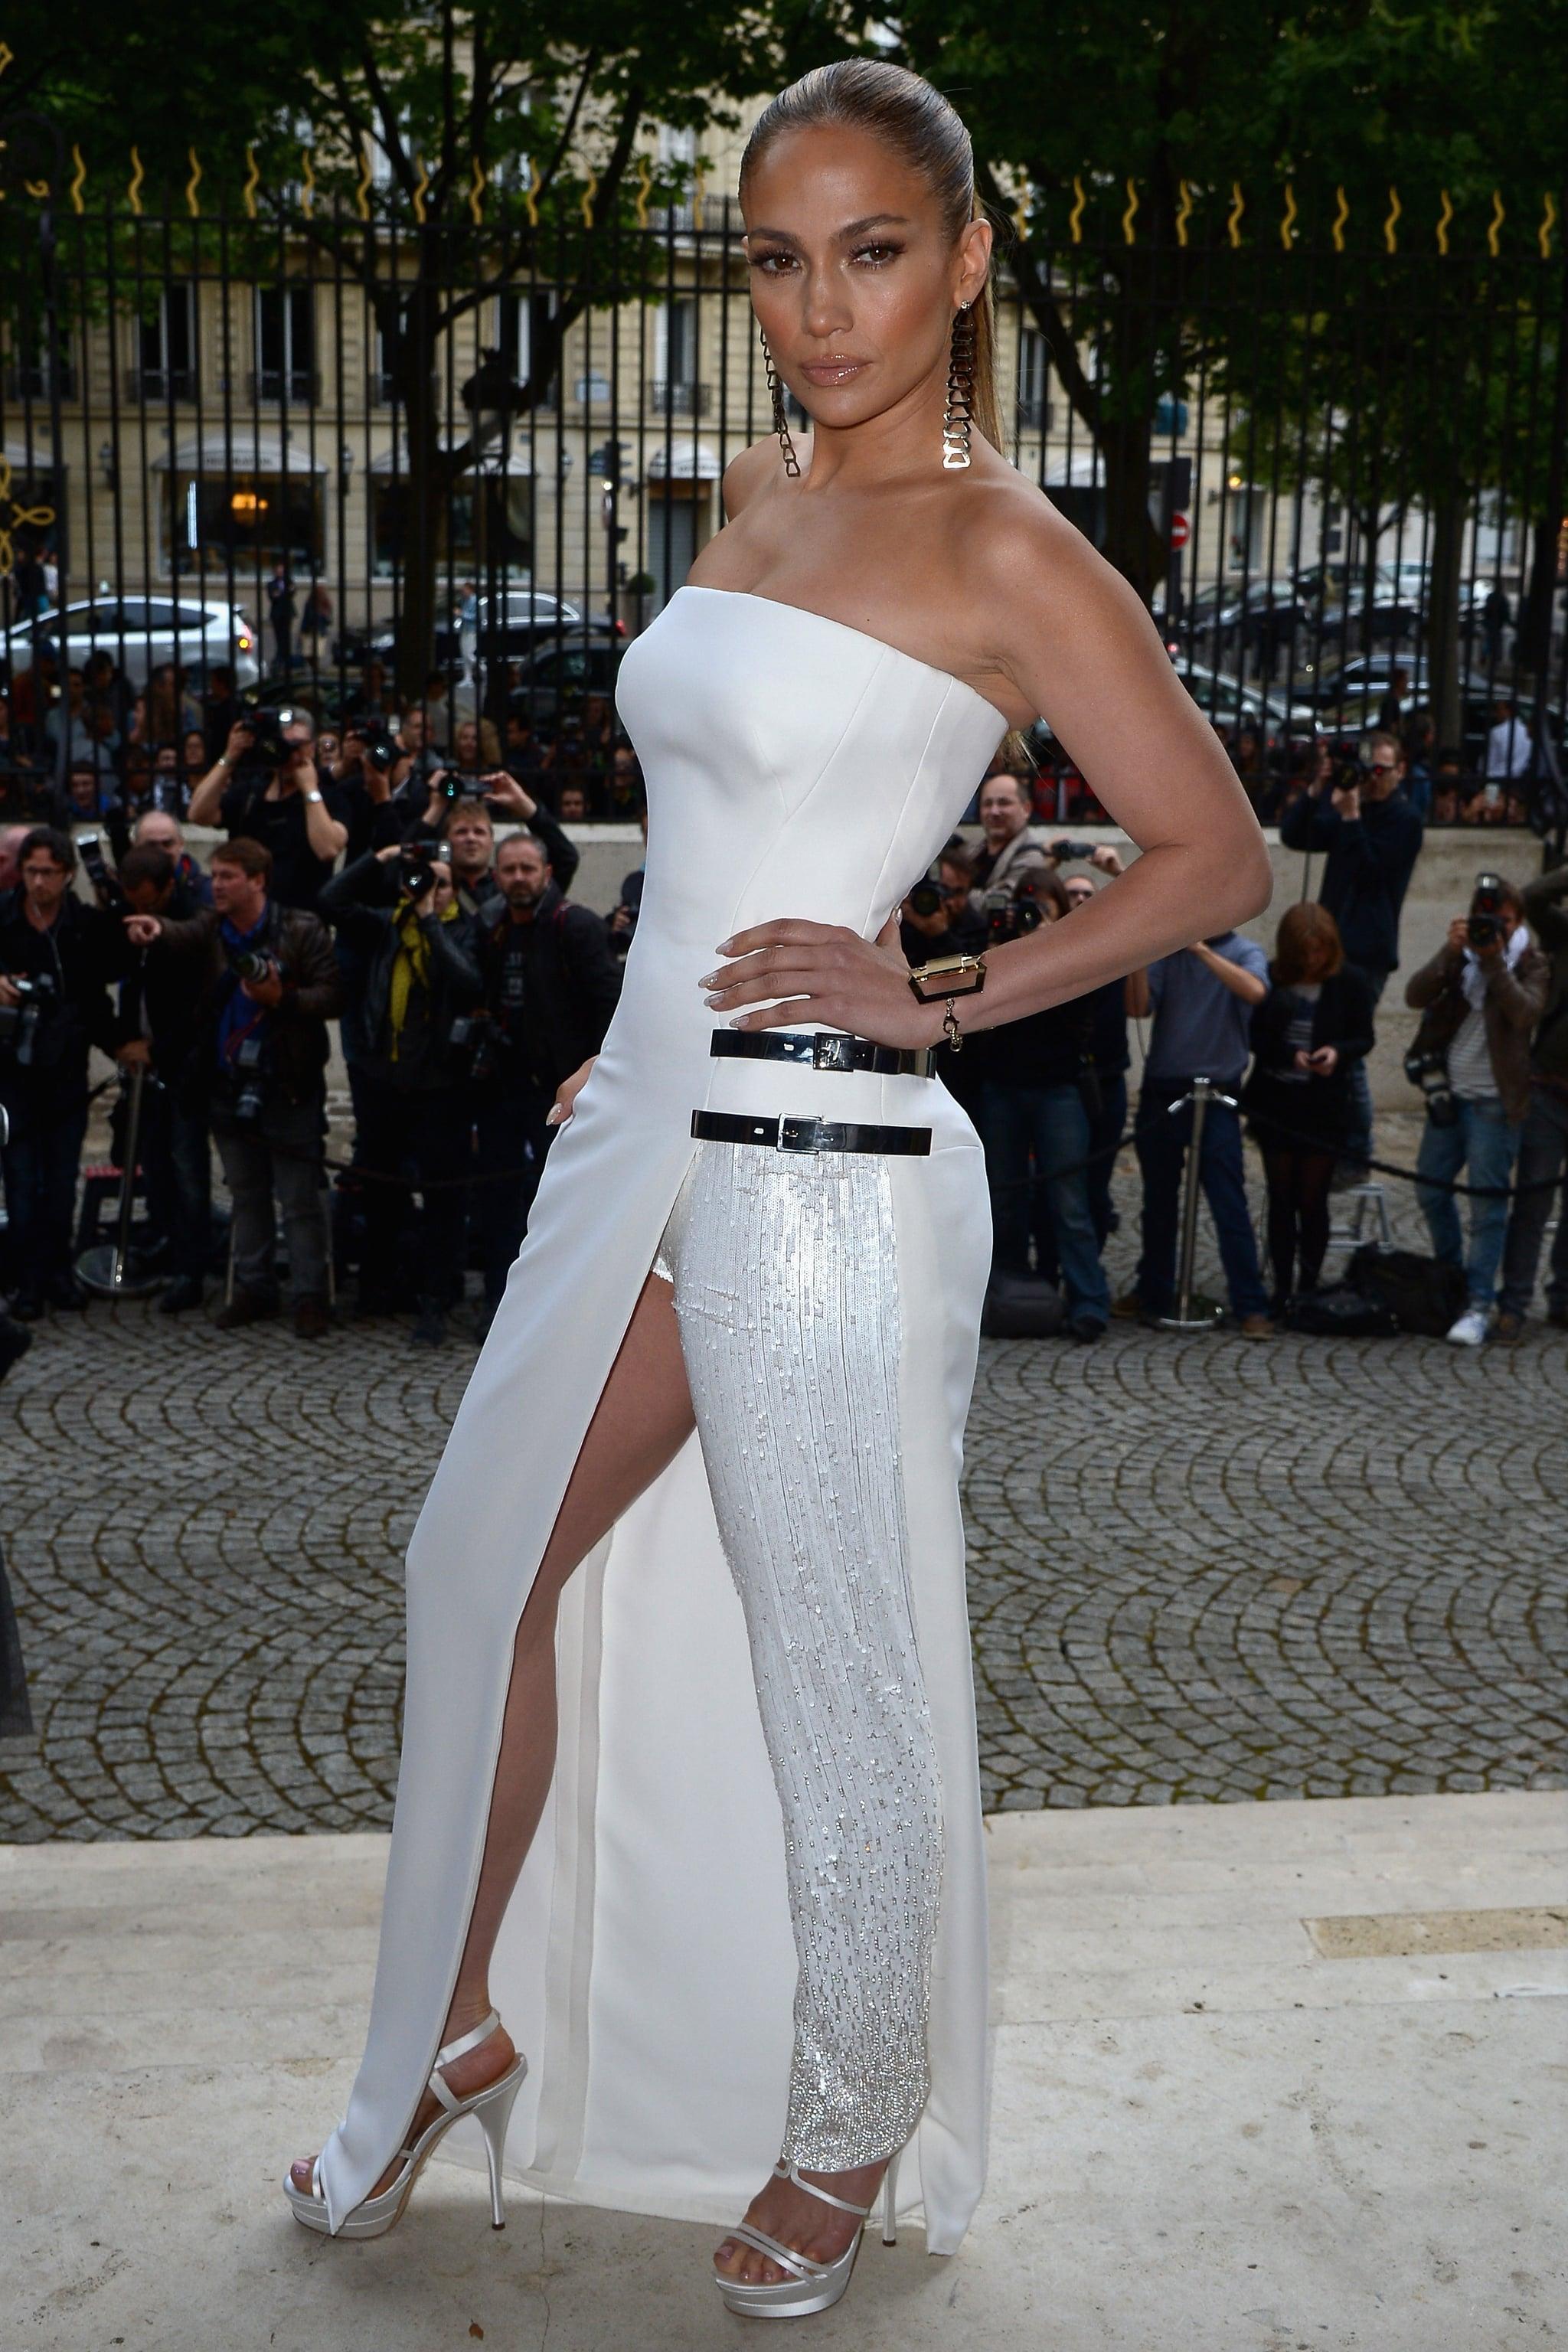 During Paris Haute Couture Fashion Week 2014, Jennifer struck a pose in a dress/pants Versace hybrid.